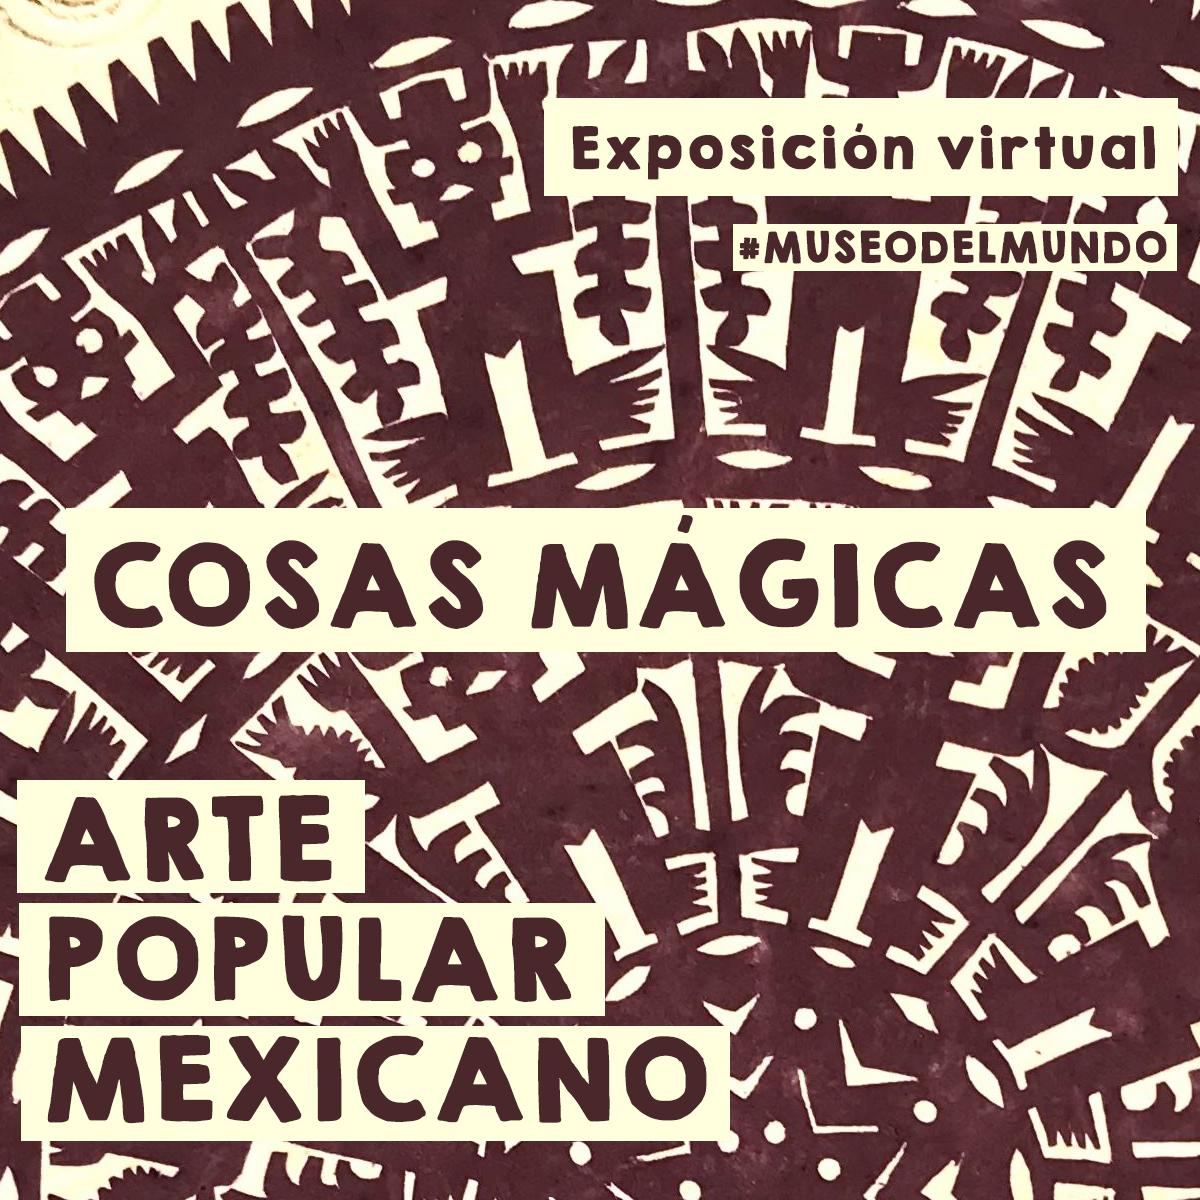 [Exposición virtual] Cosas Mágicas: Arte Popular Mexicano